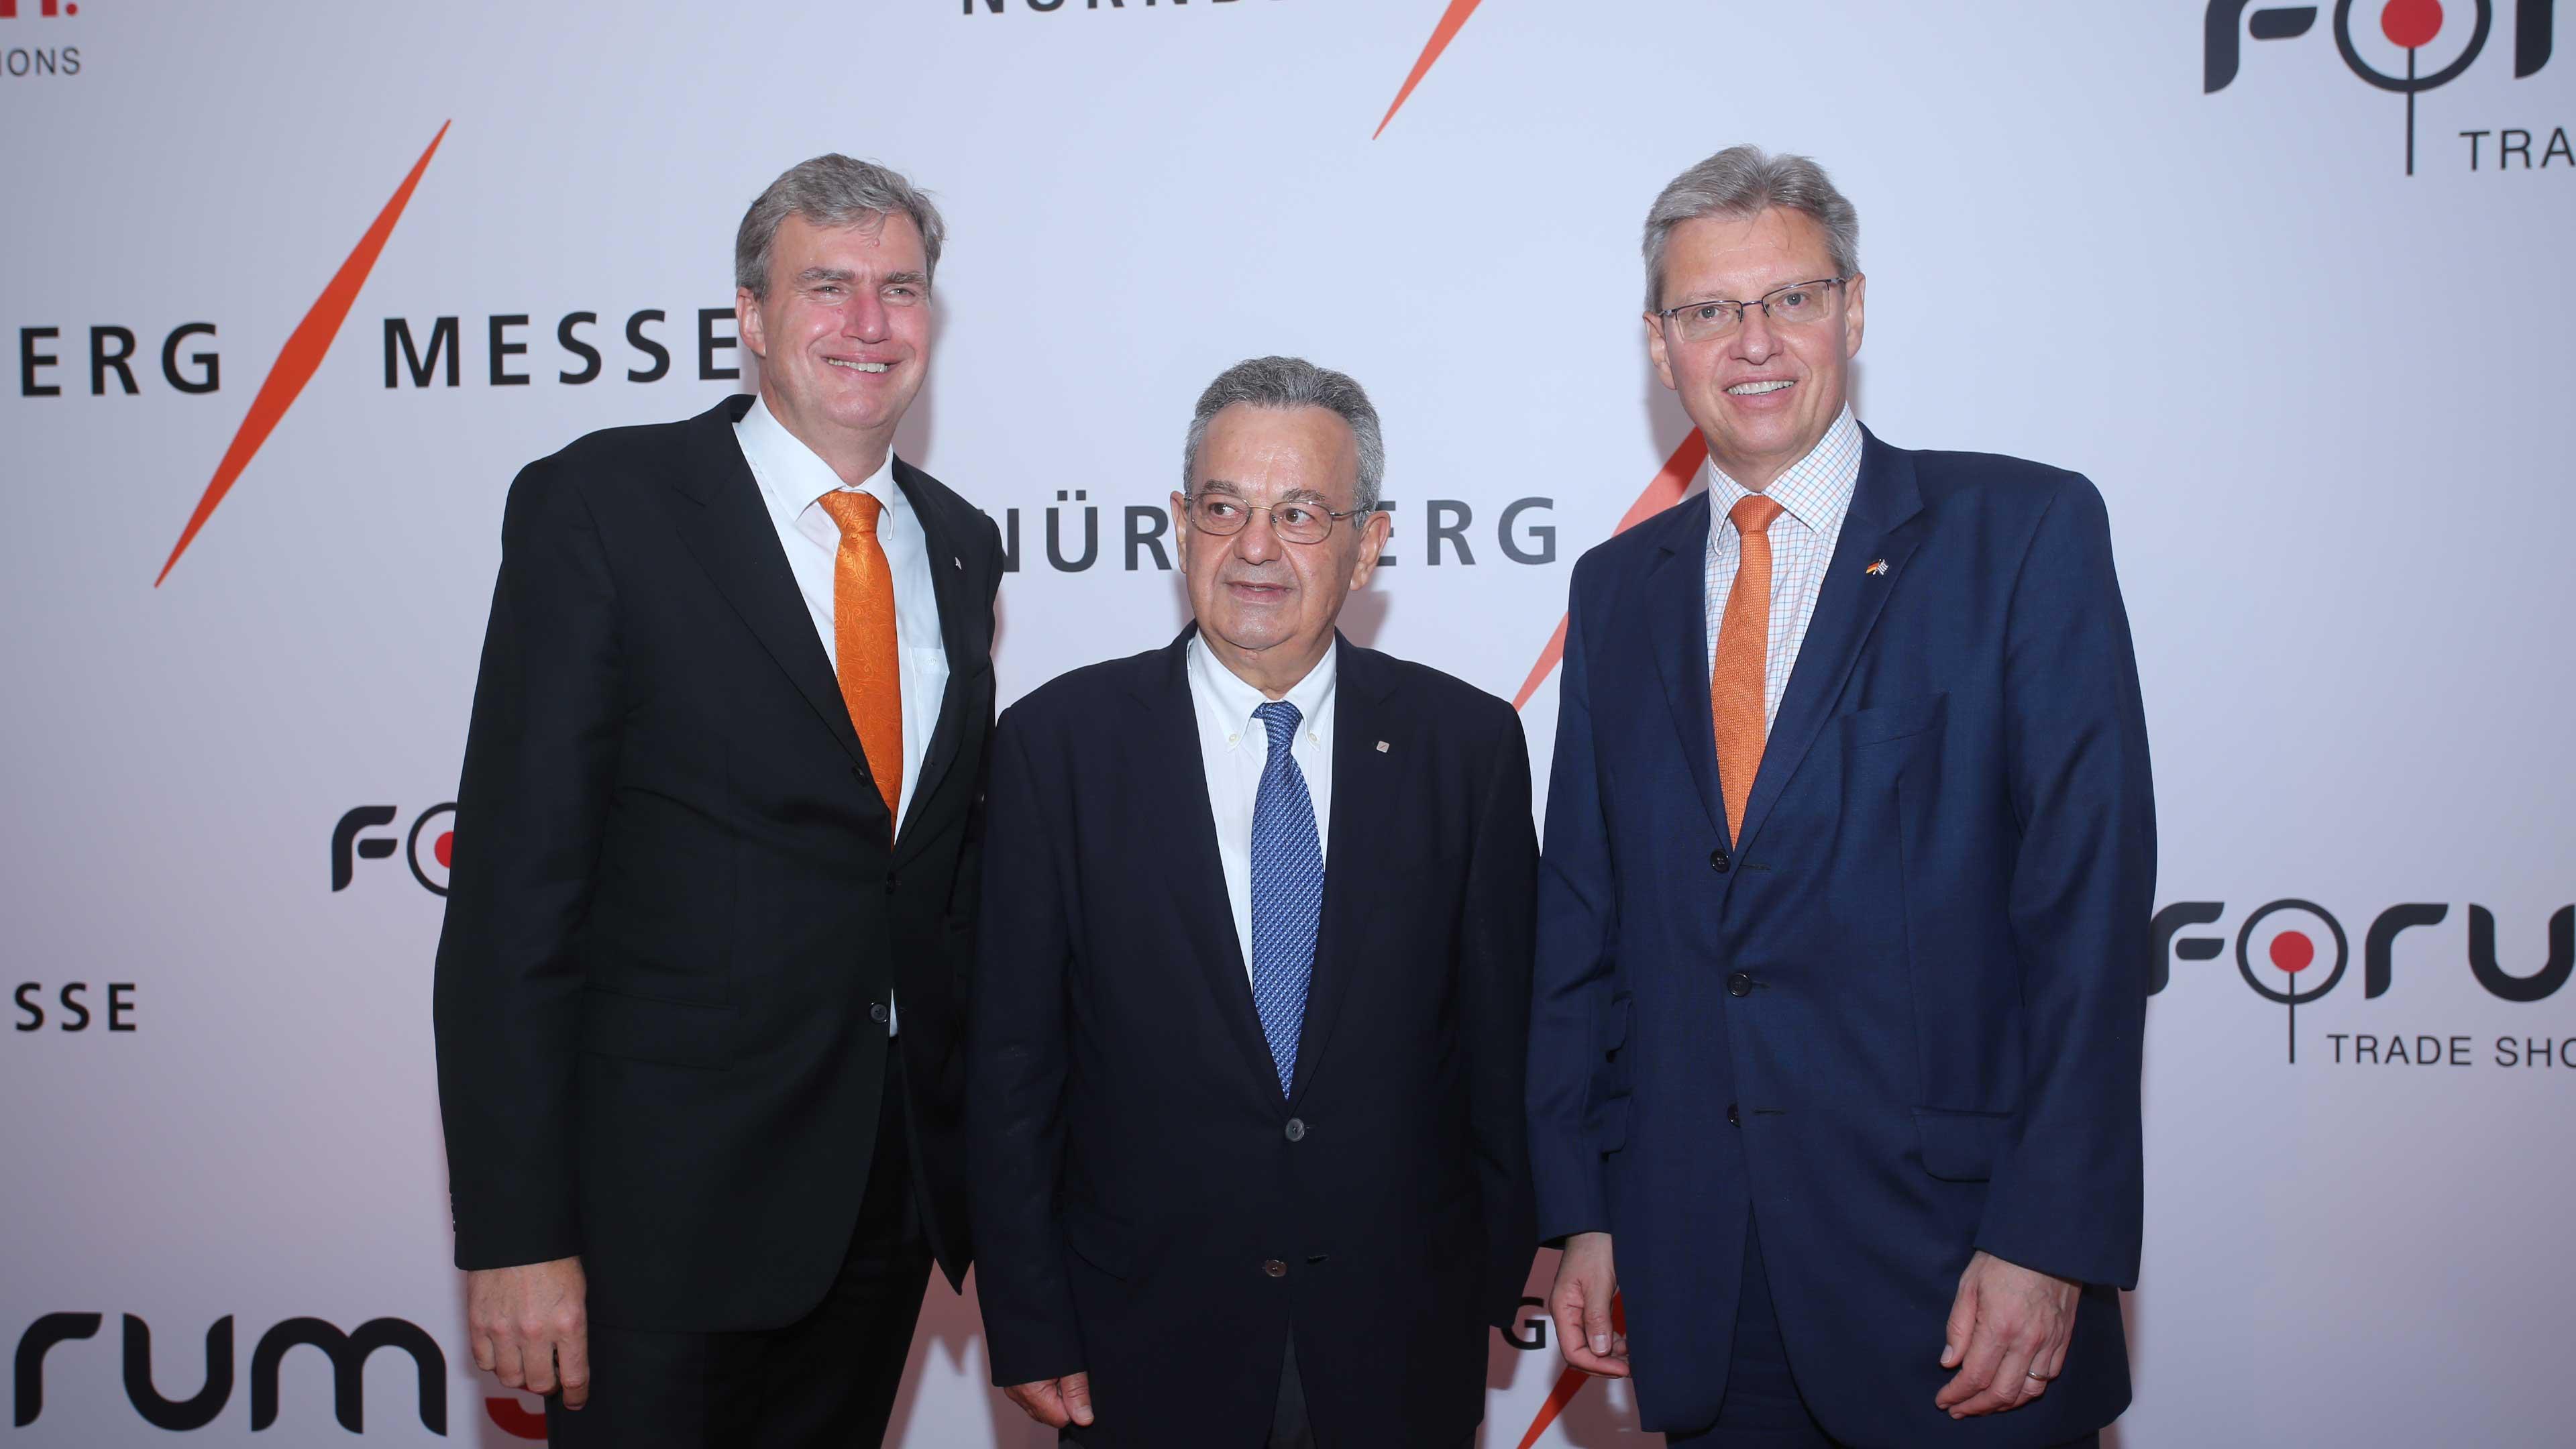 NurnbergMesse - FORUM SA